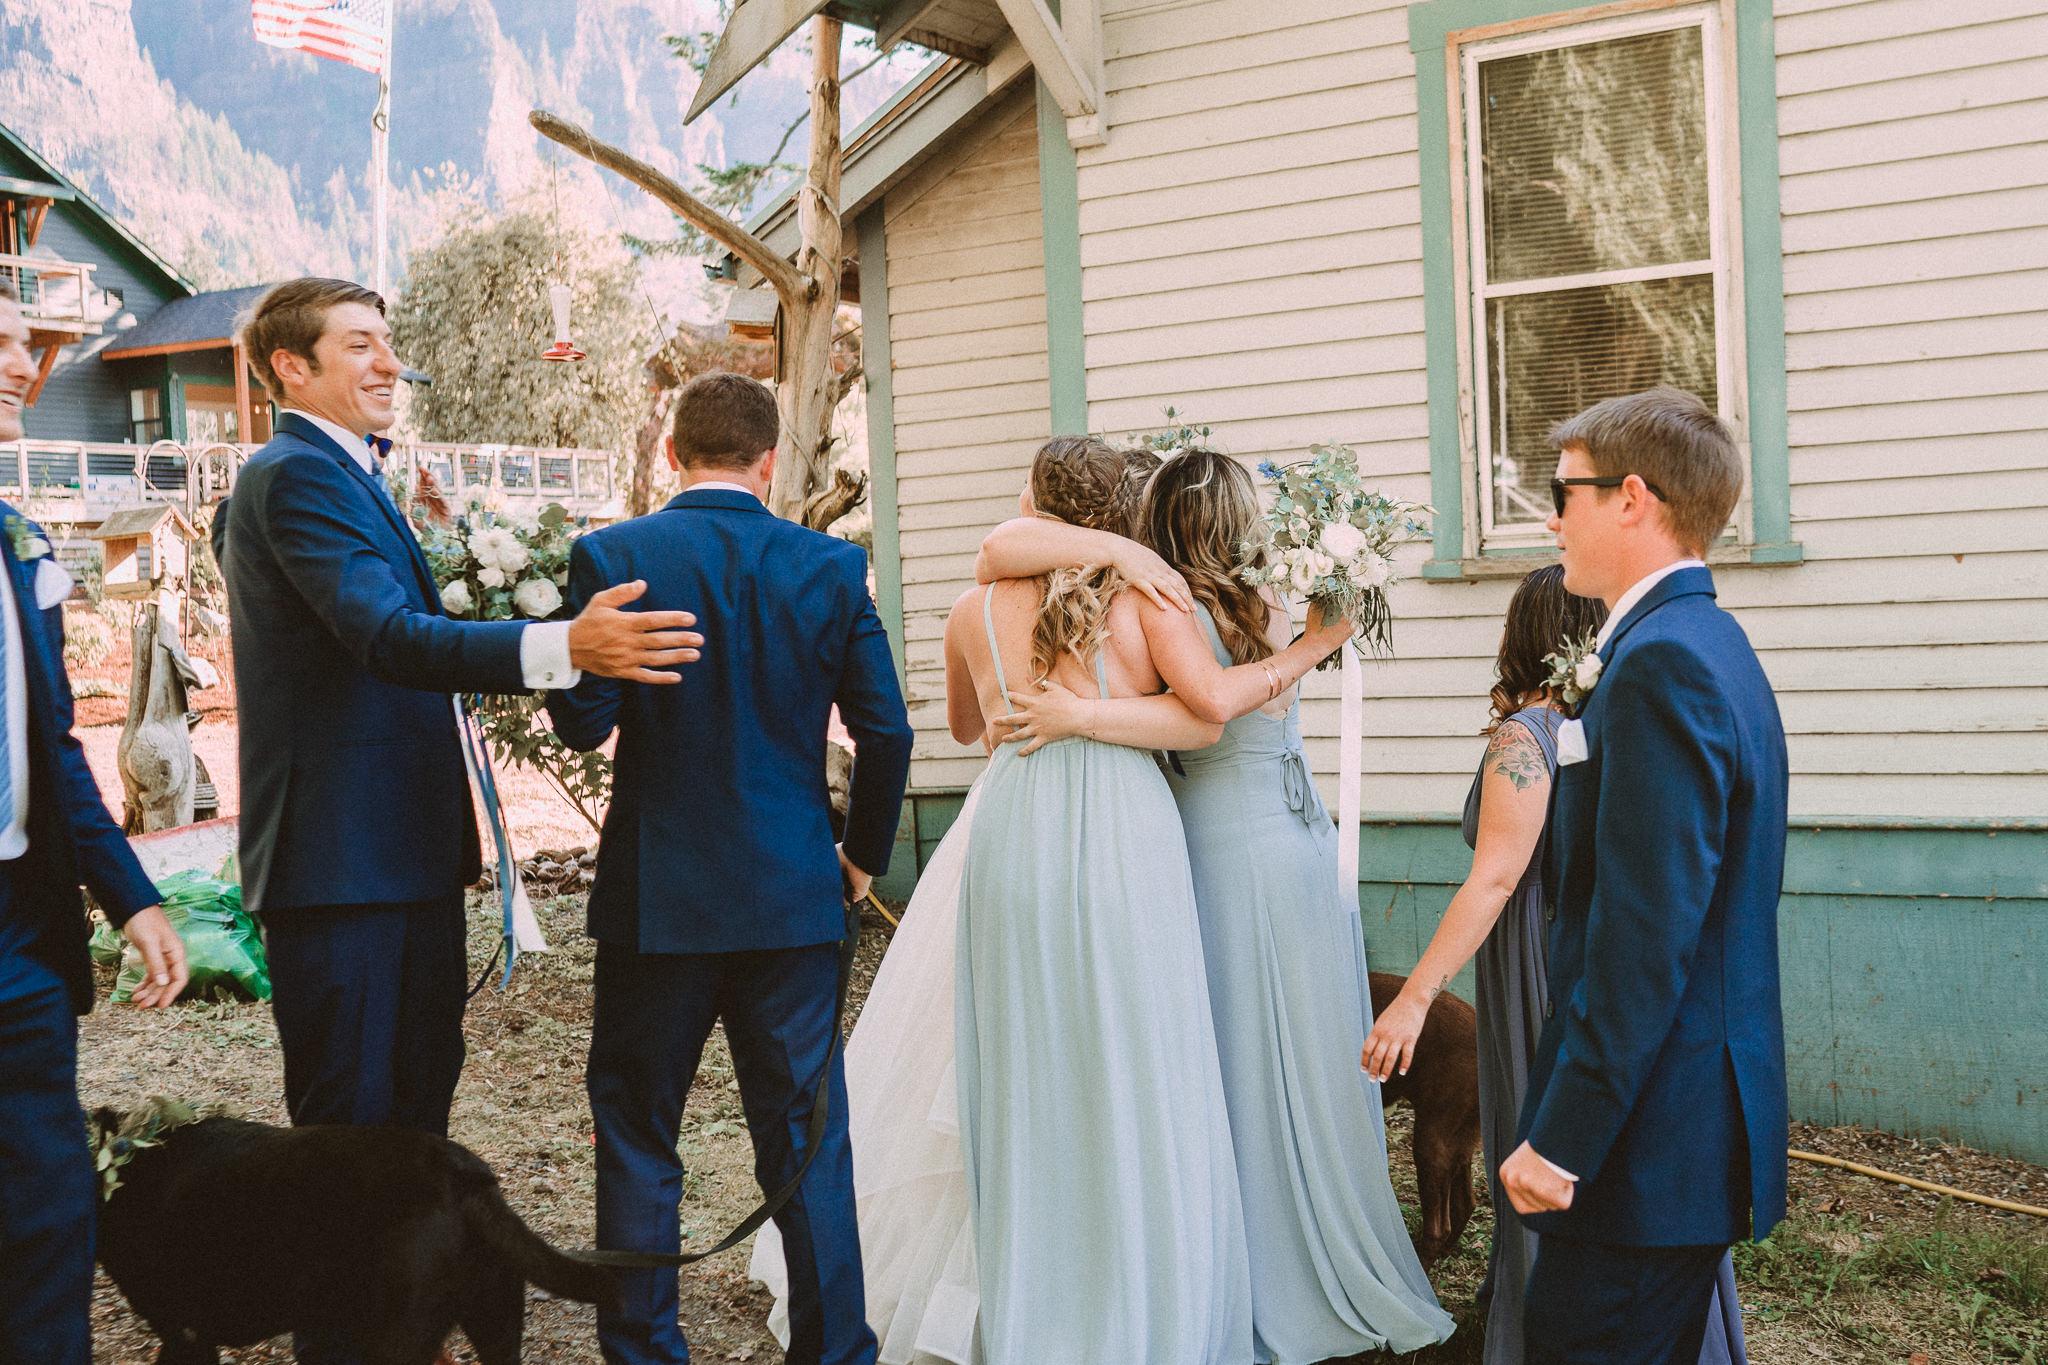 post ceremony Bridesmaid hug bride groomsmen wedding party Photographer Best of